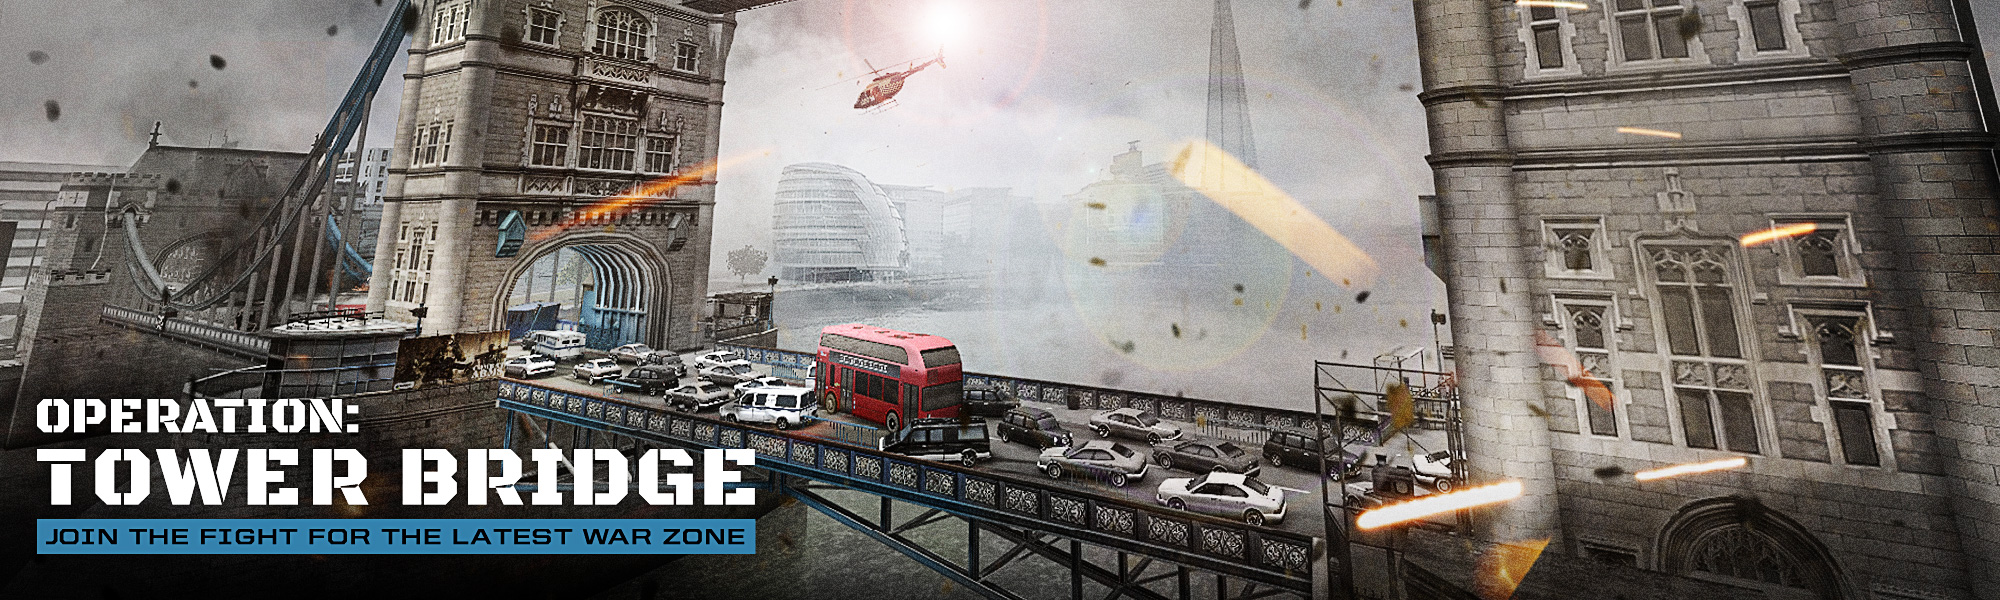 Operation Tower Bridge Banner